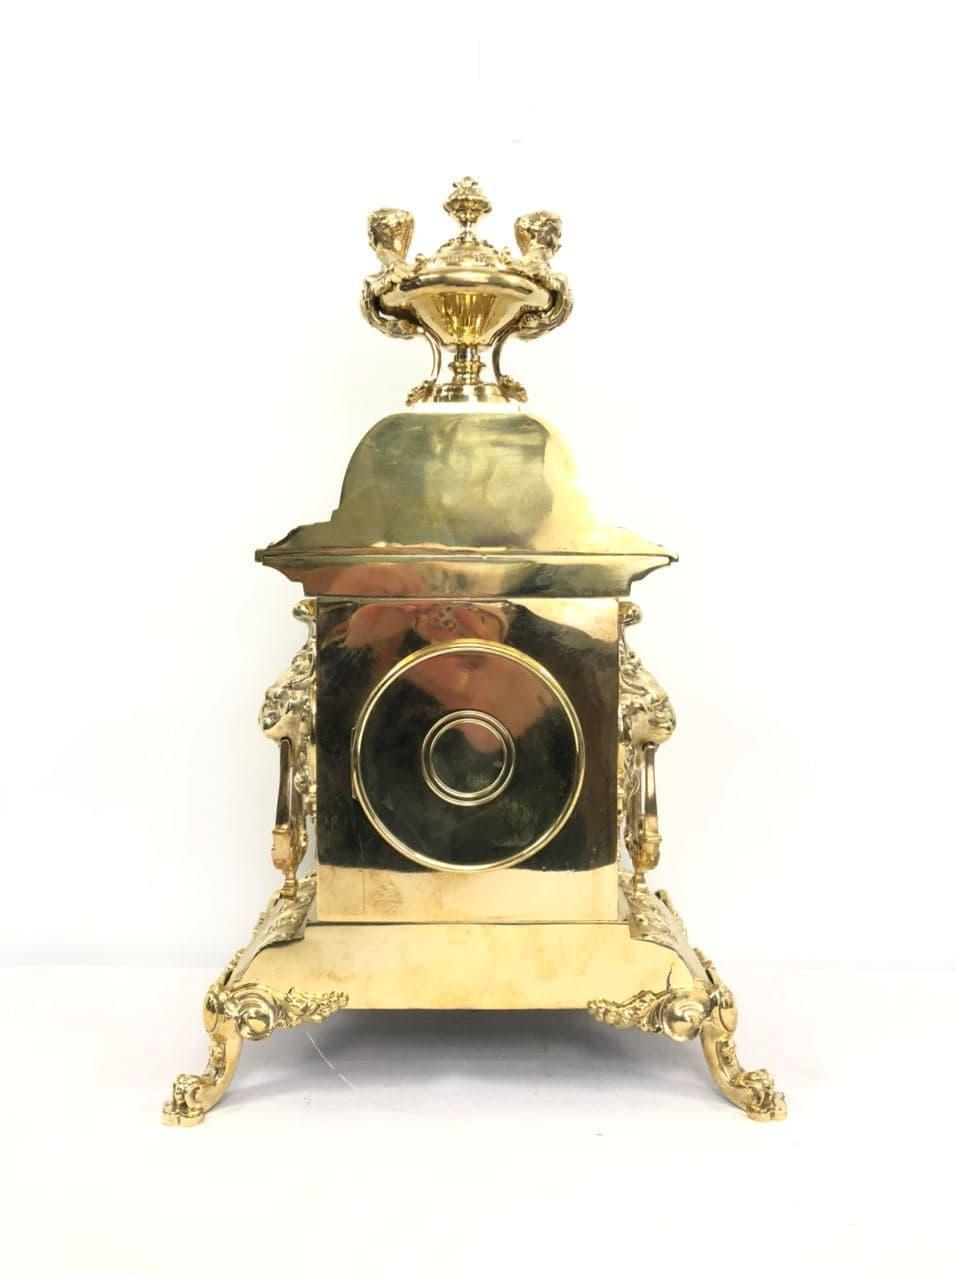 Антикварные часы из бронзы